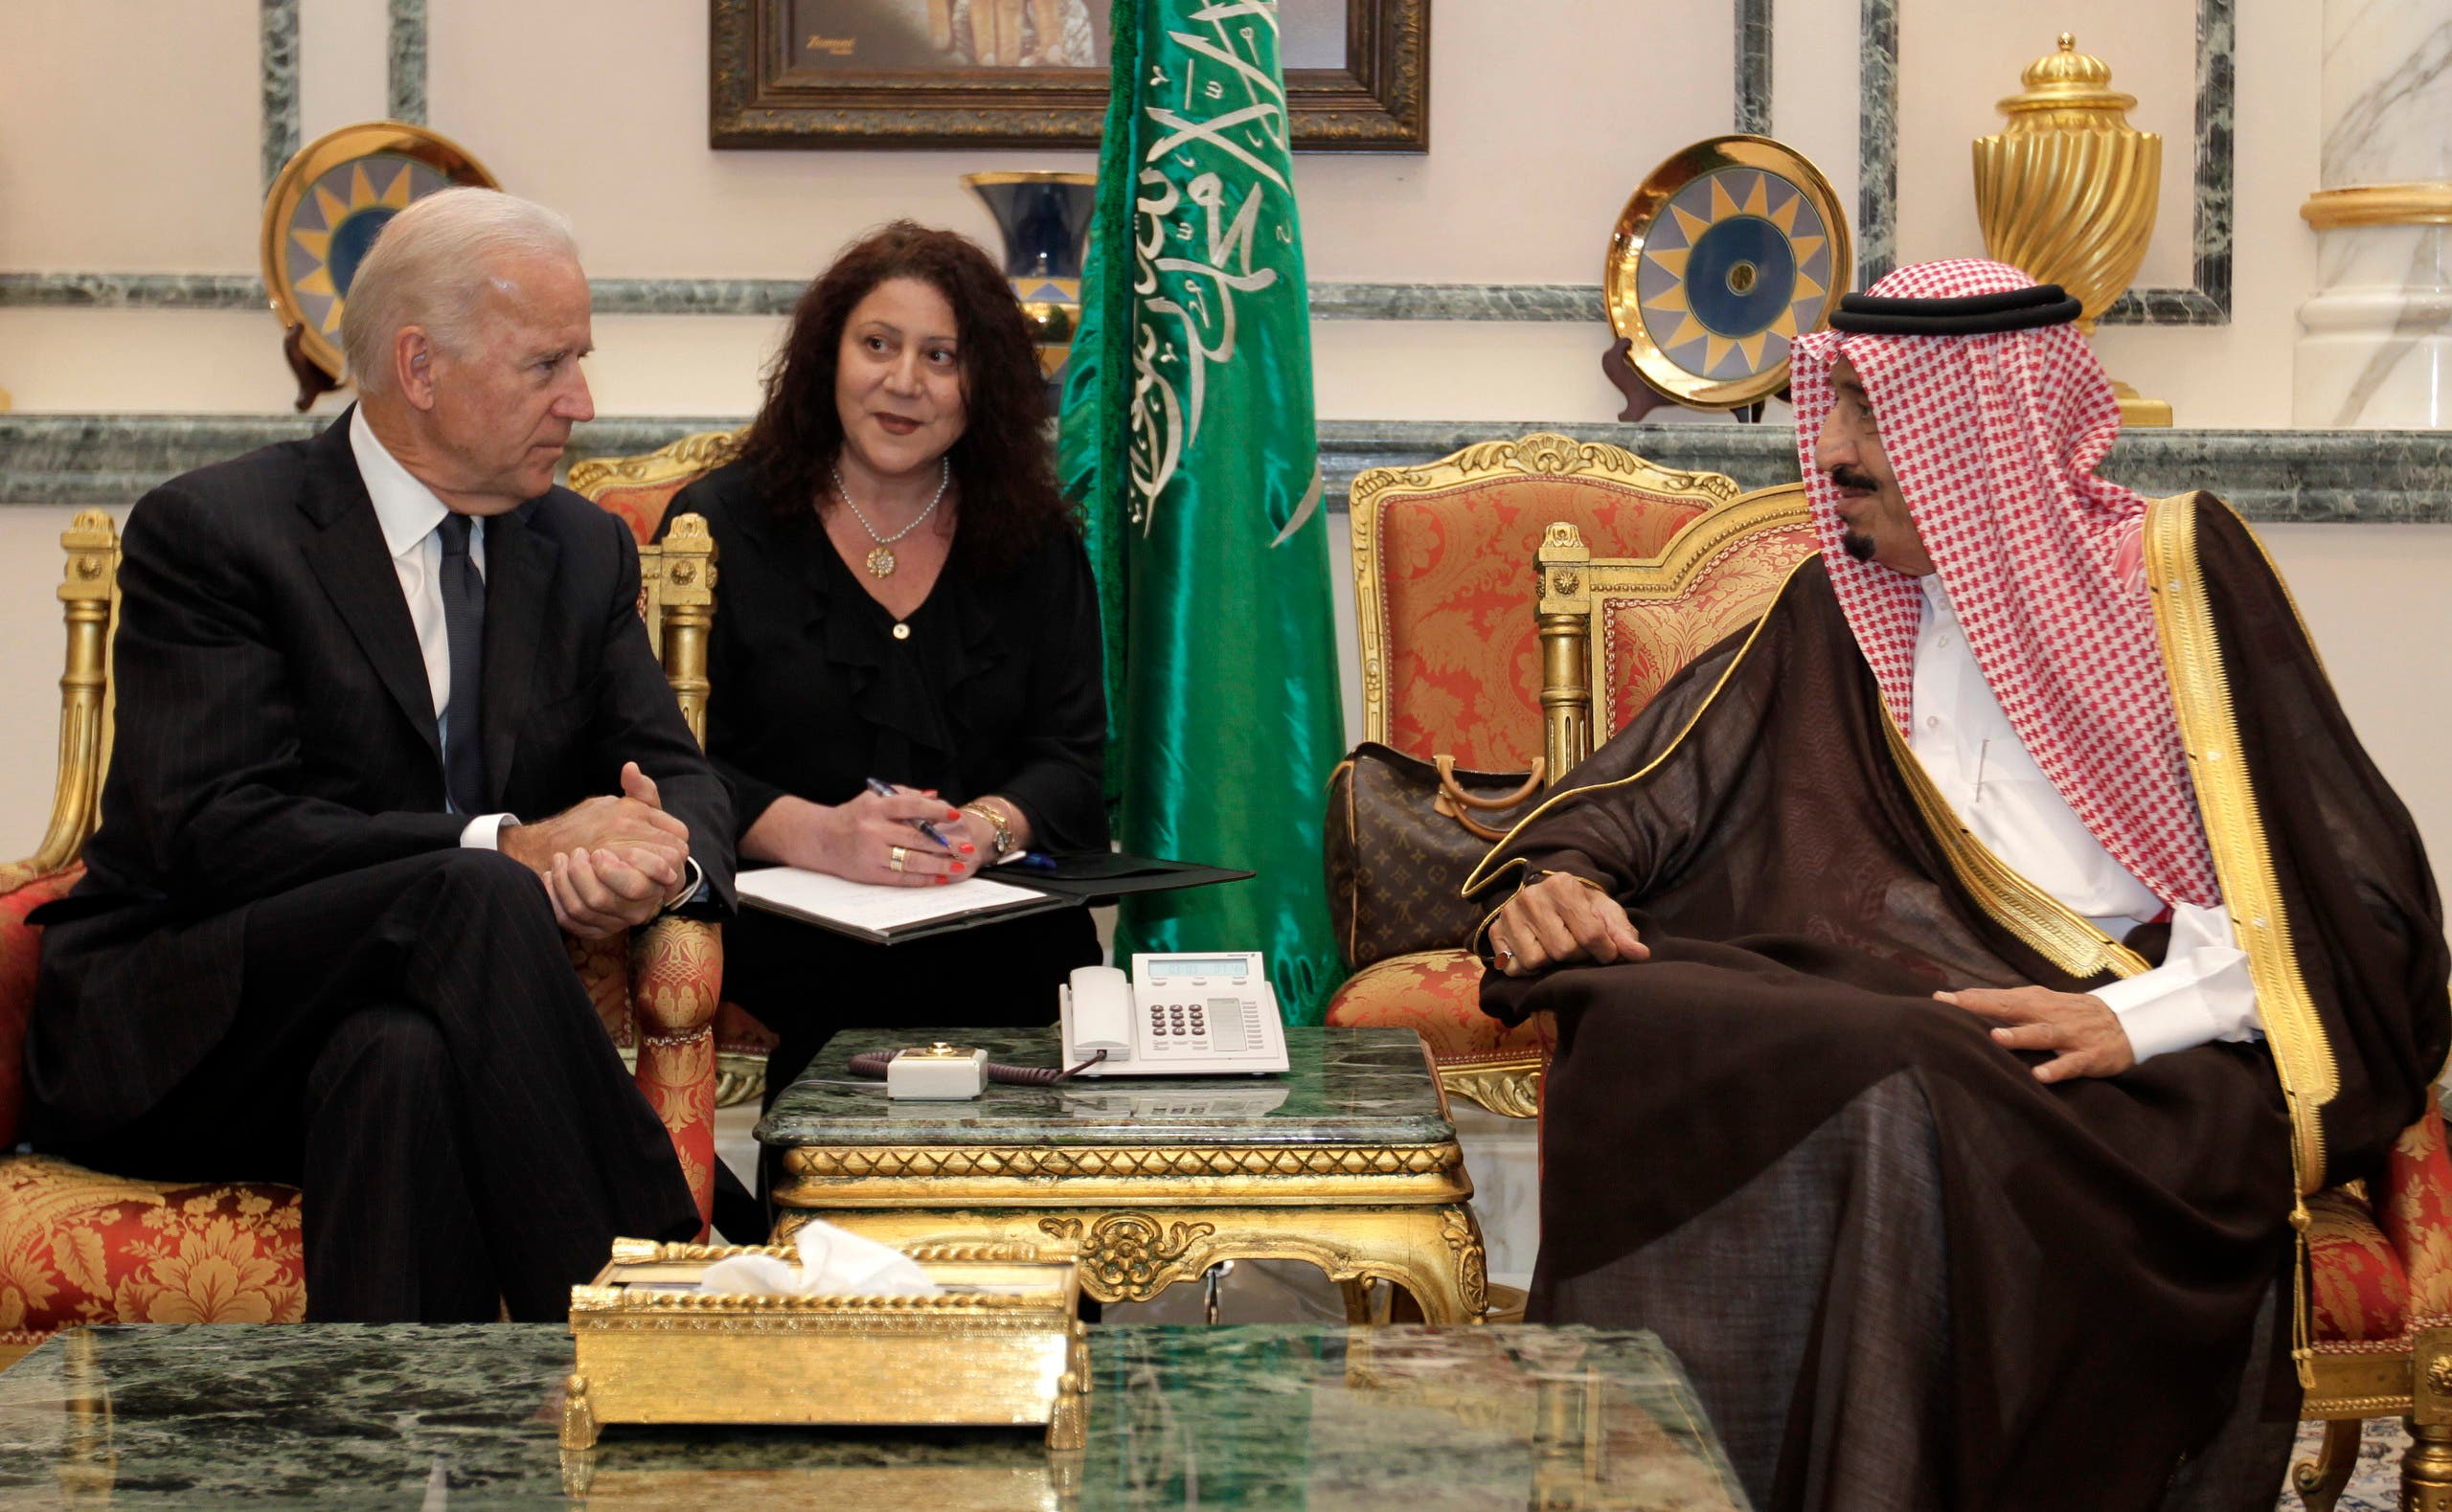 Then- US Vice President Joe Biden, right, offers his condolences to then-Prince Salman bin Abdulaziz upon the death of on his brother Saudi Crown Prince Sultan bin AbdulAziz Al Saud on Oct. 27, 2011. (File photo: AP)